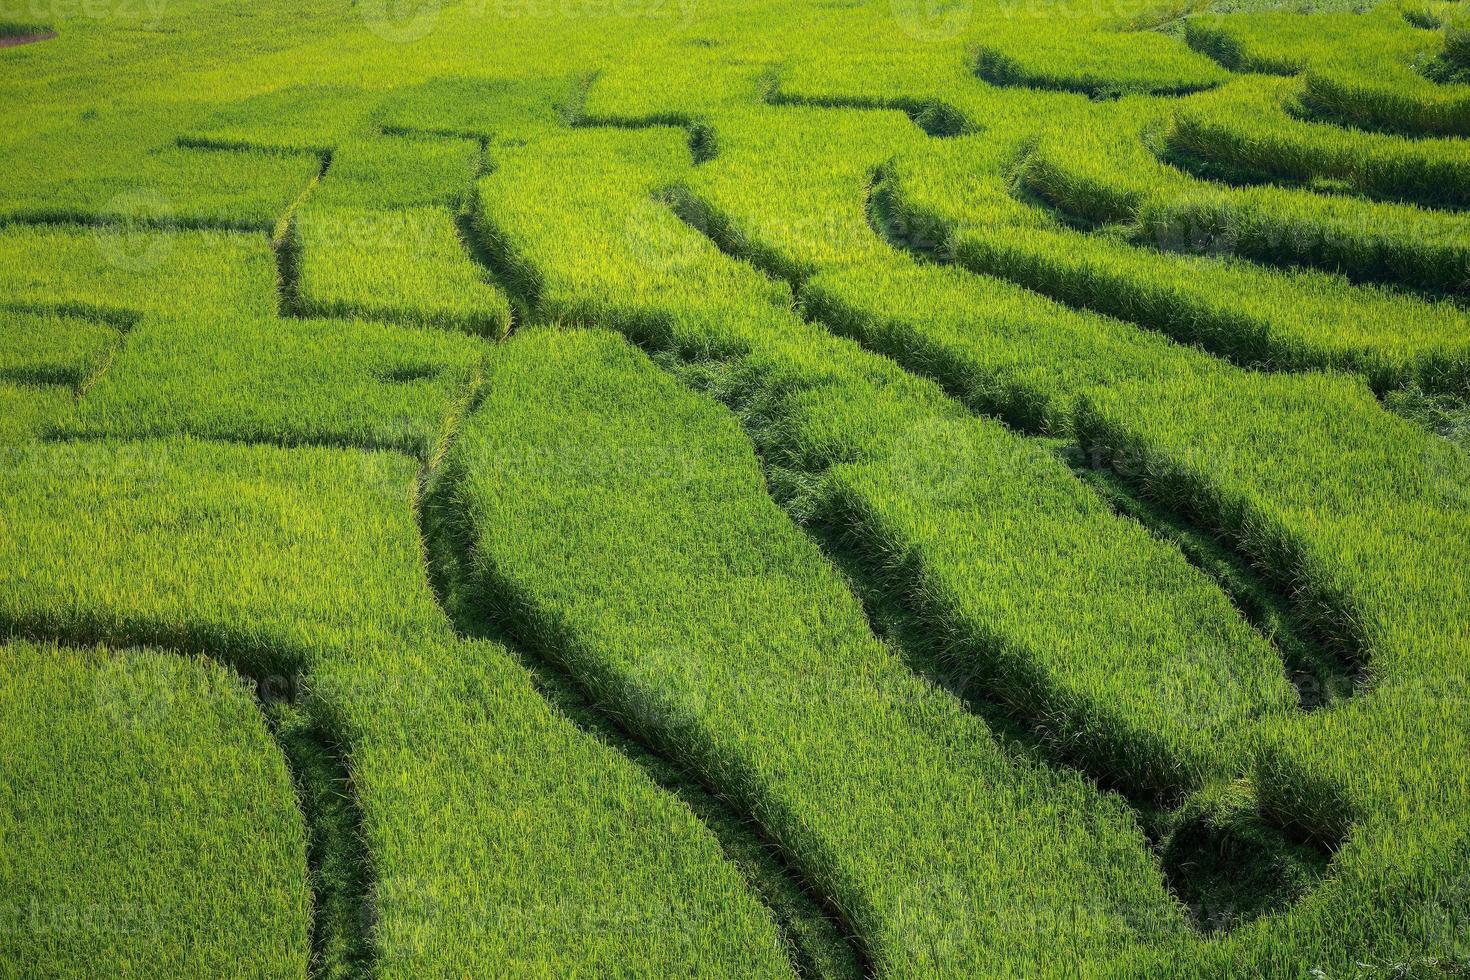 groene terrasvormige rijst veld achtergrond foto